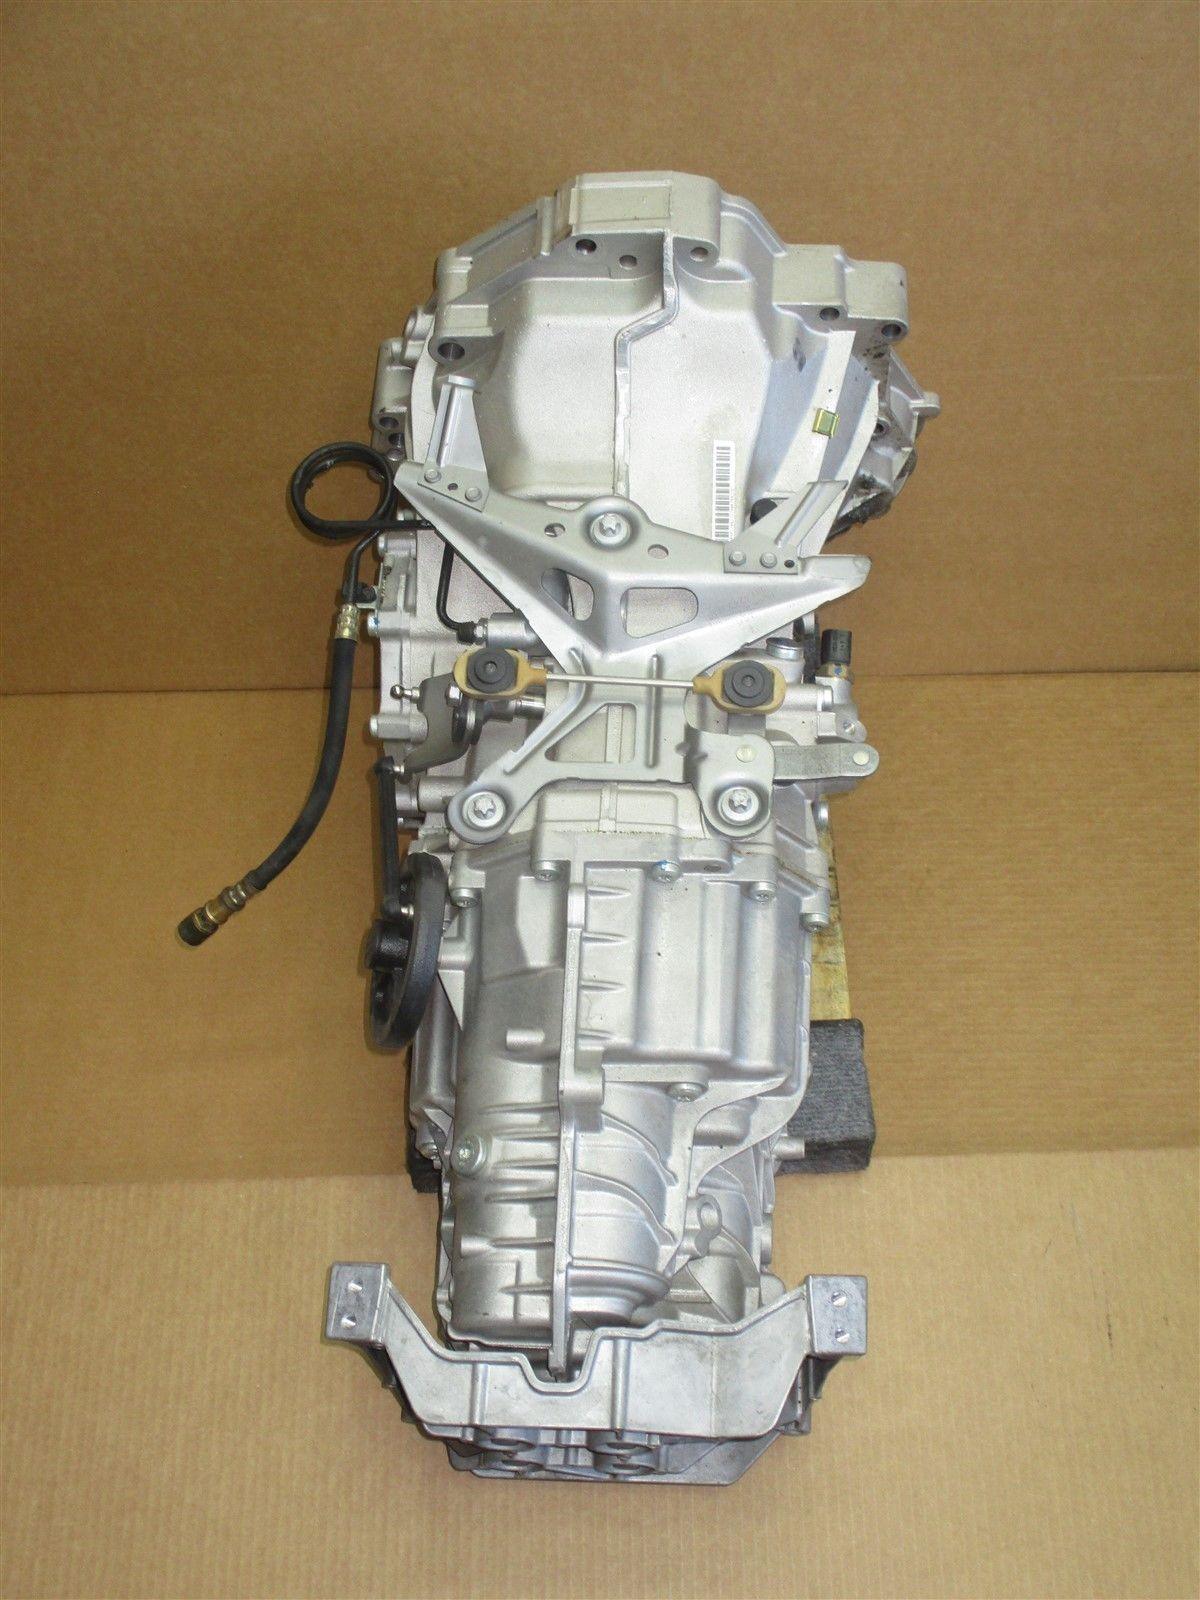 08 Boxster S RWD Porsche 987 6 SPEED MANUAL TRANSMISSION GEAR BOX G87.21  56,346 | eBay